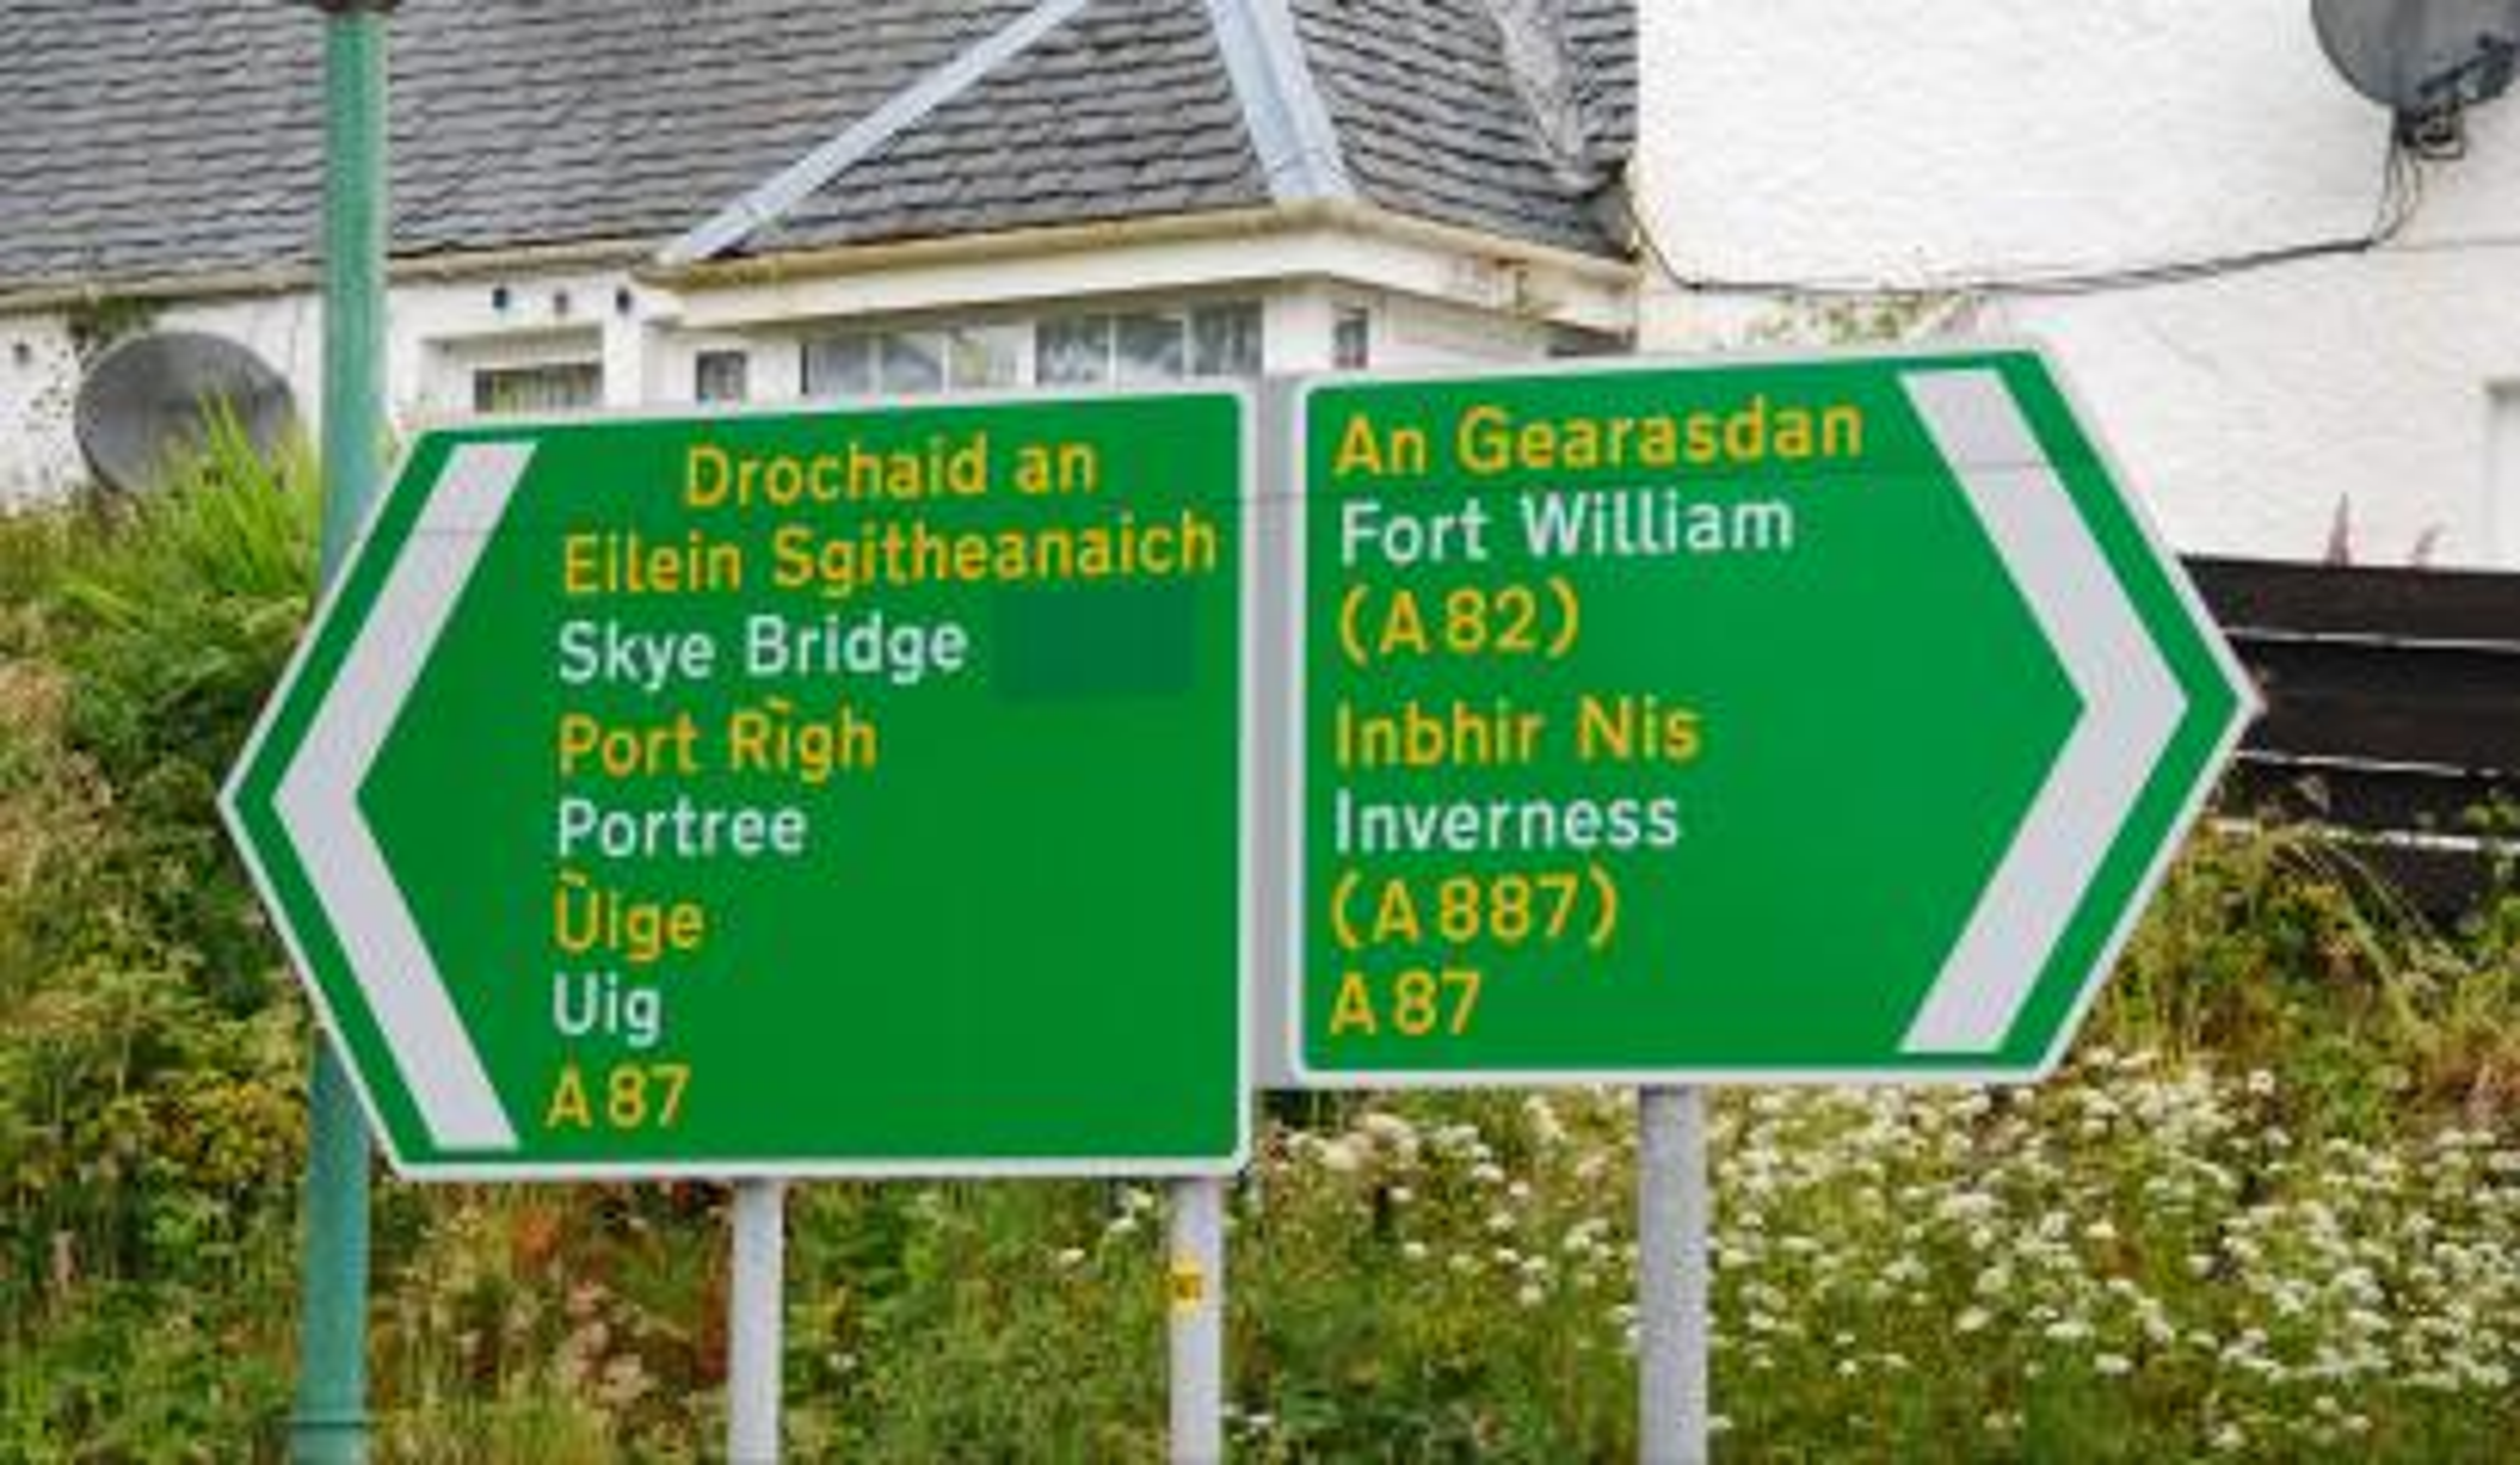 Gaelic/English road sign in Scotland